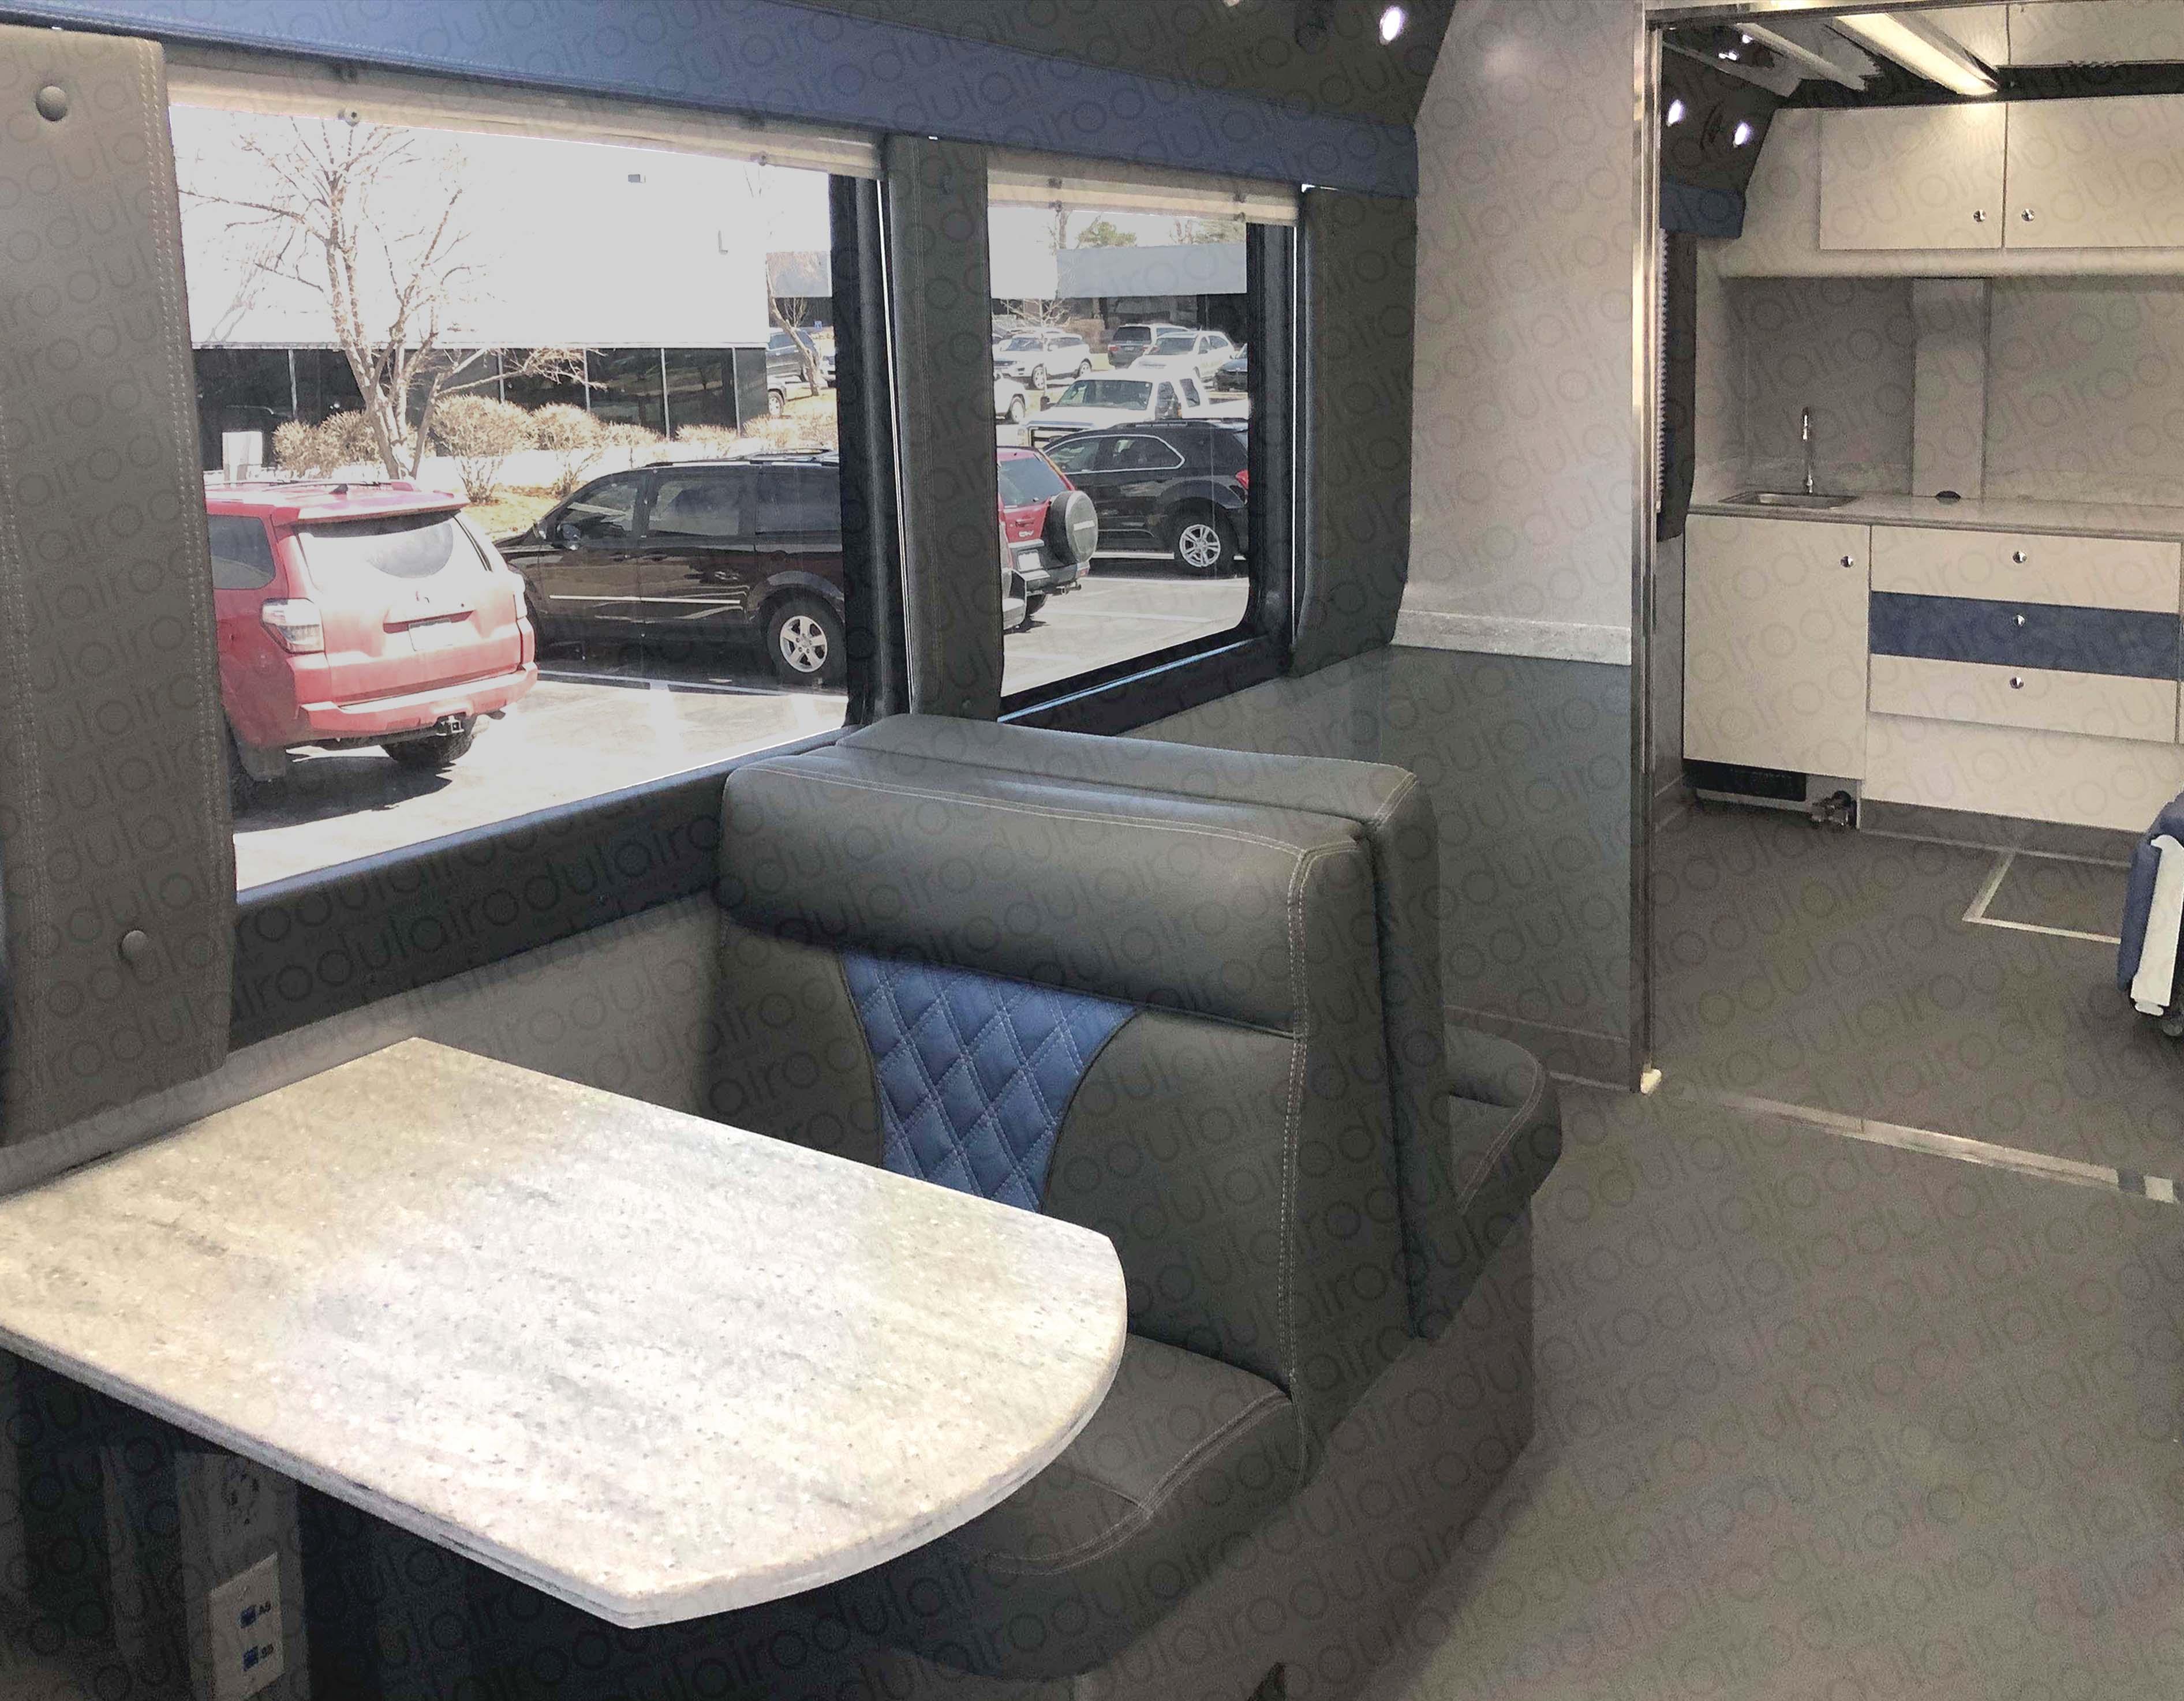 Home - Mobile Clinics on a Bus - Mobile Dental, Medical